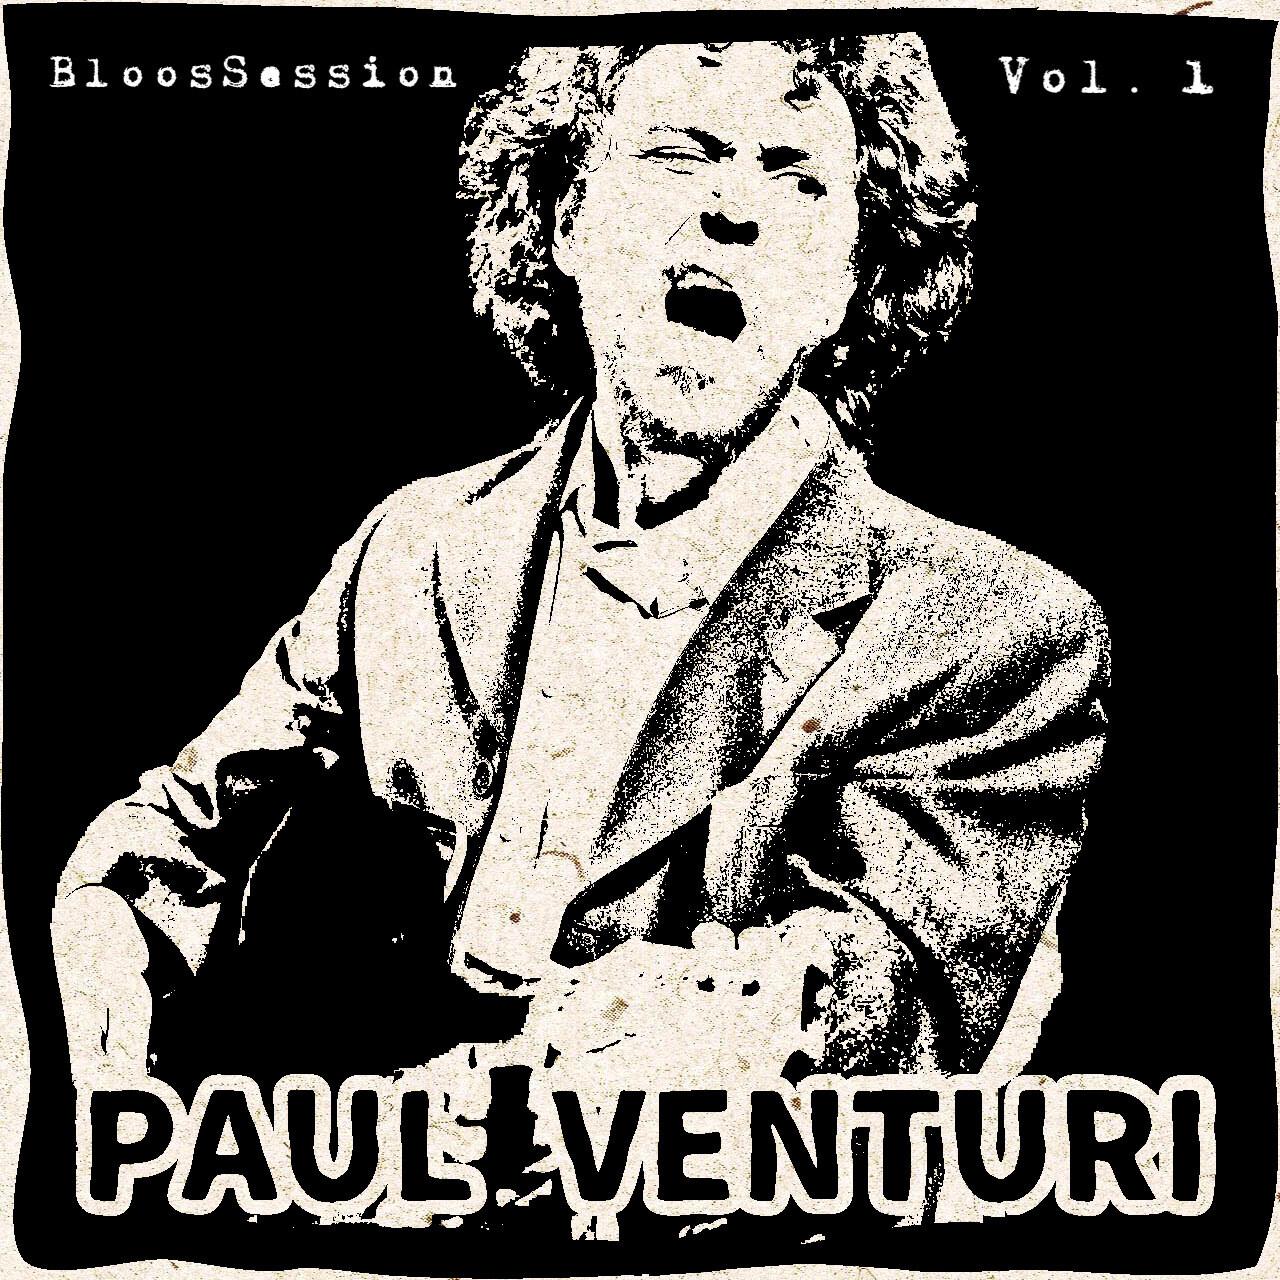 Bloossession Vol.1 - PAUL VENTURI (CD)